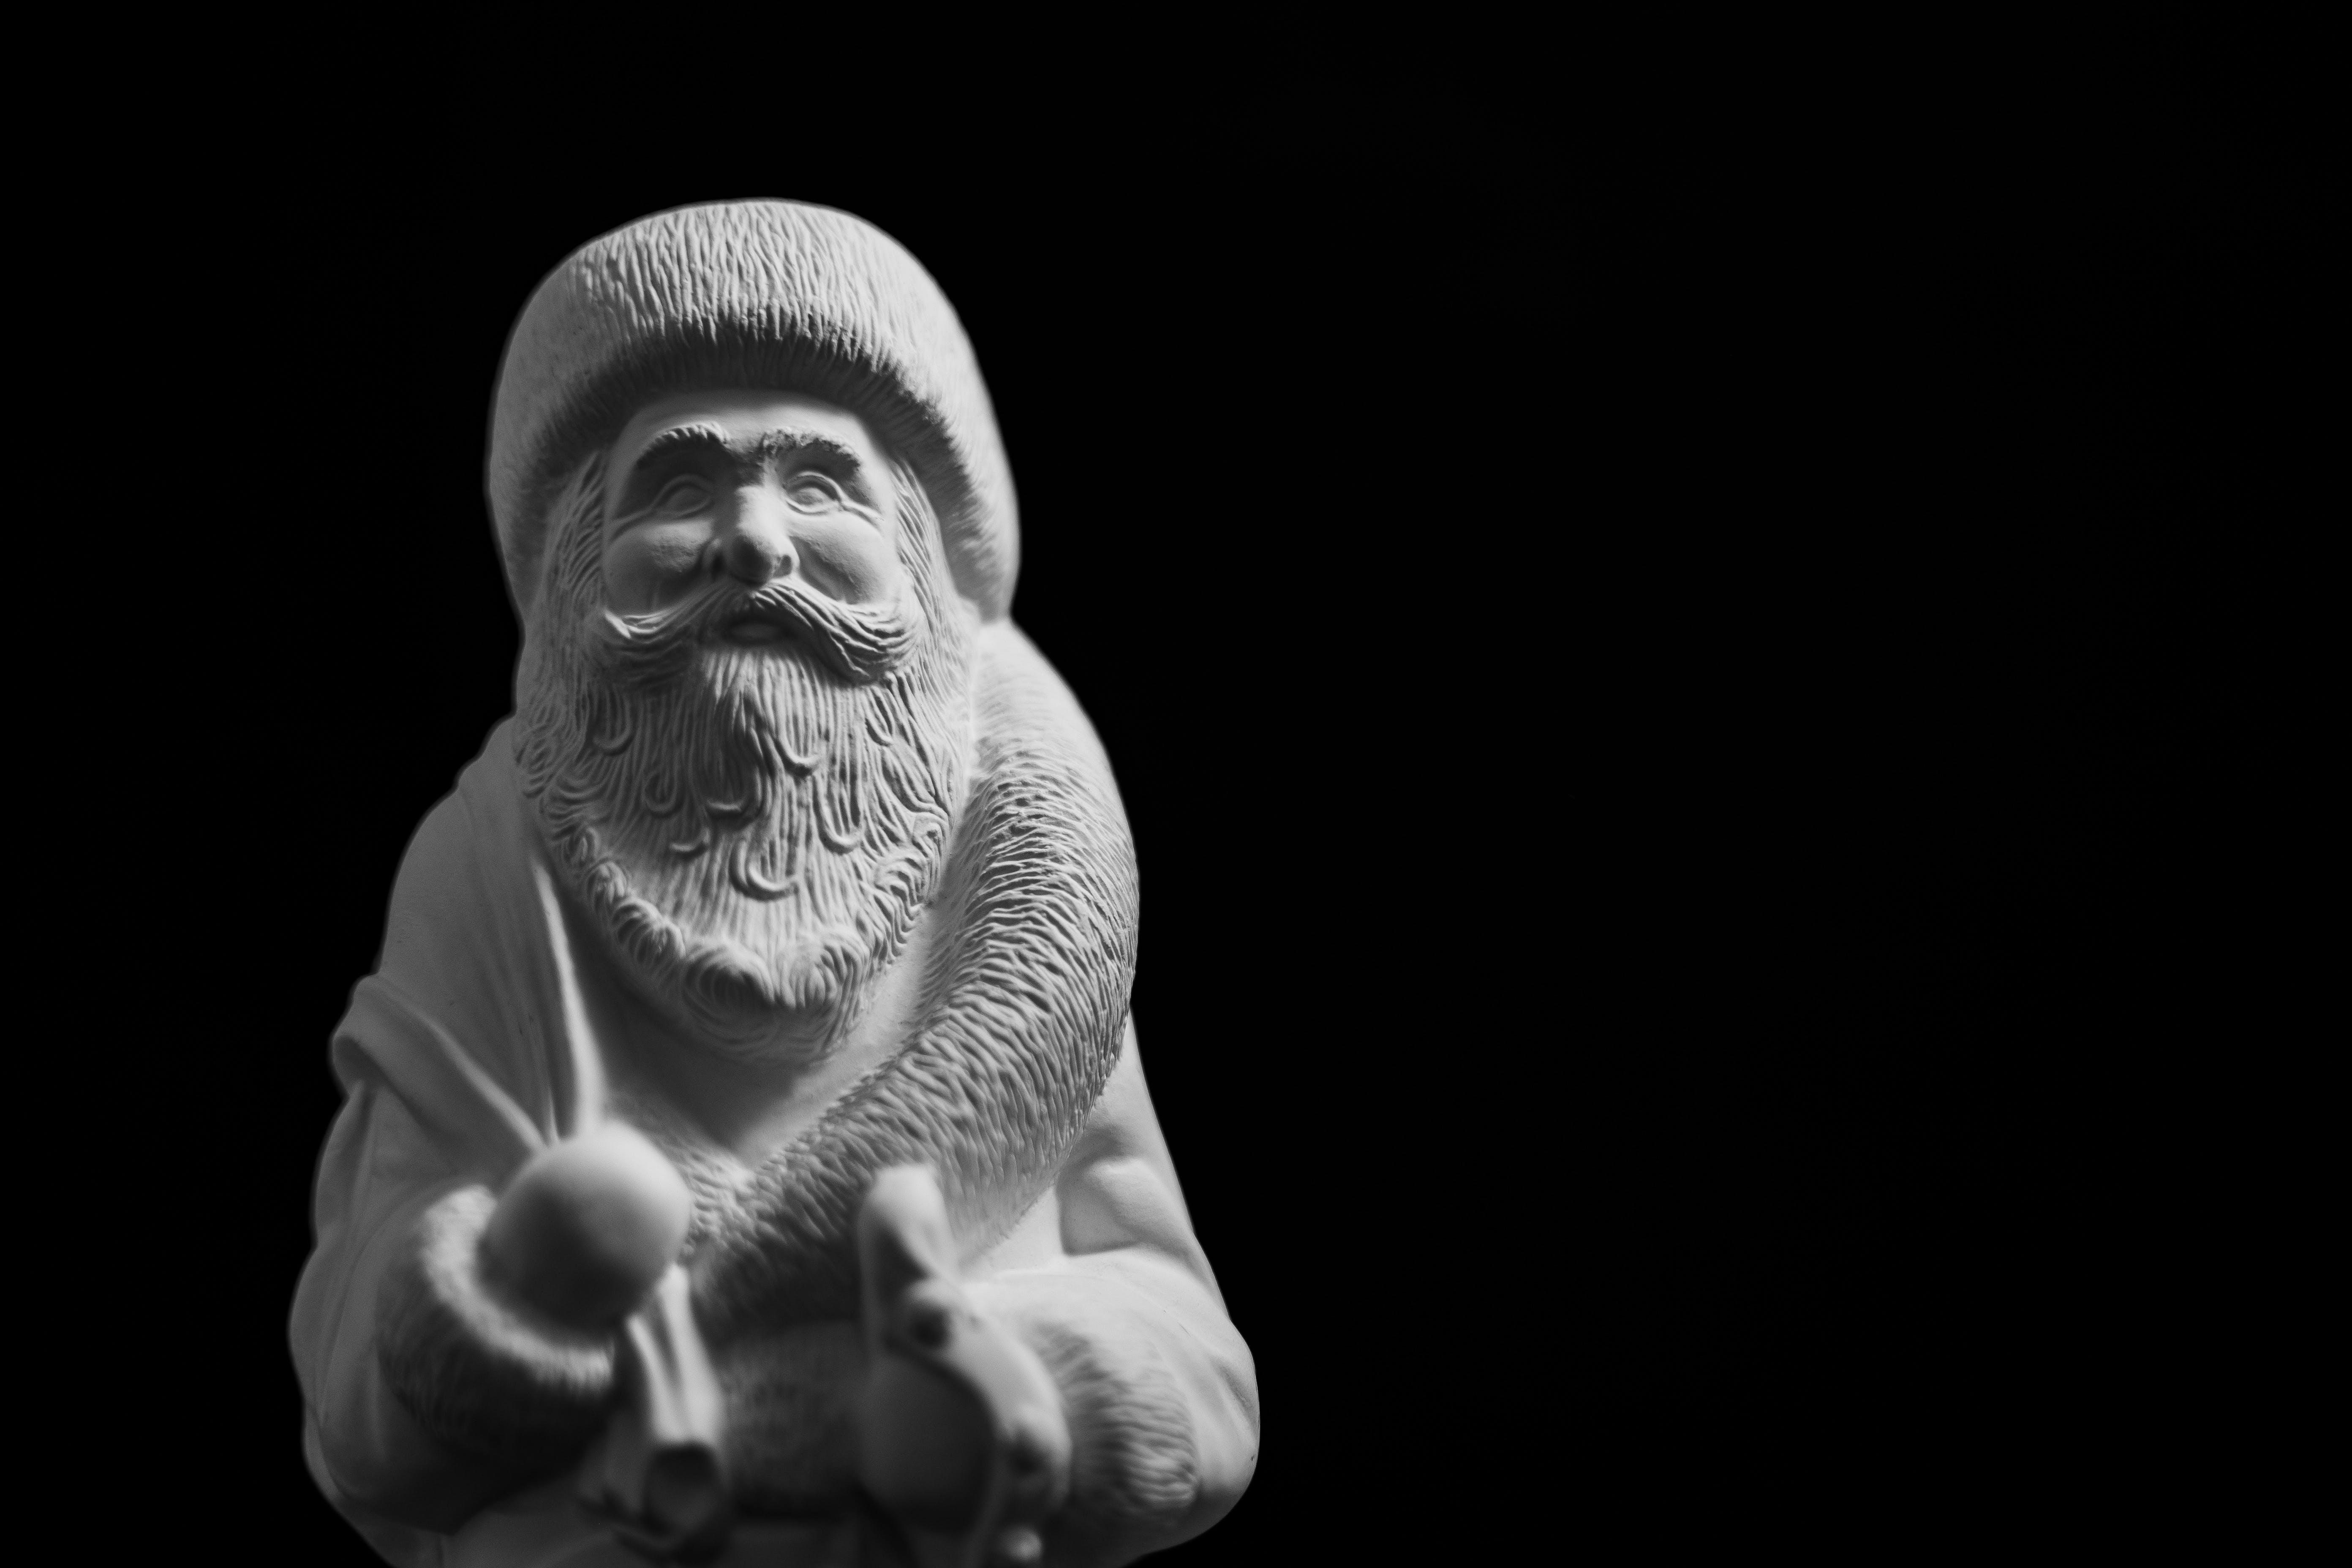 White Santa Claus Figurine